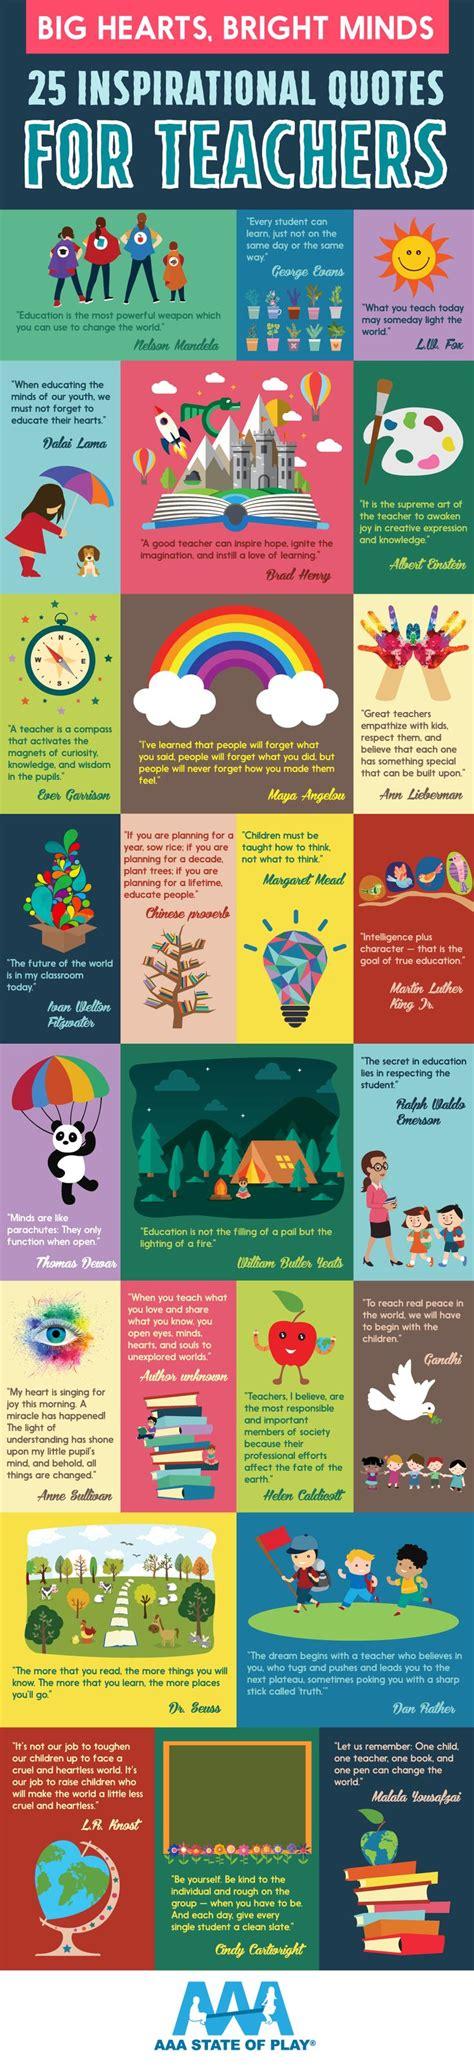 17 best images about adozen inspiration on pinterest 17 best images about teacher quotes on pinterest best